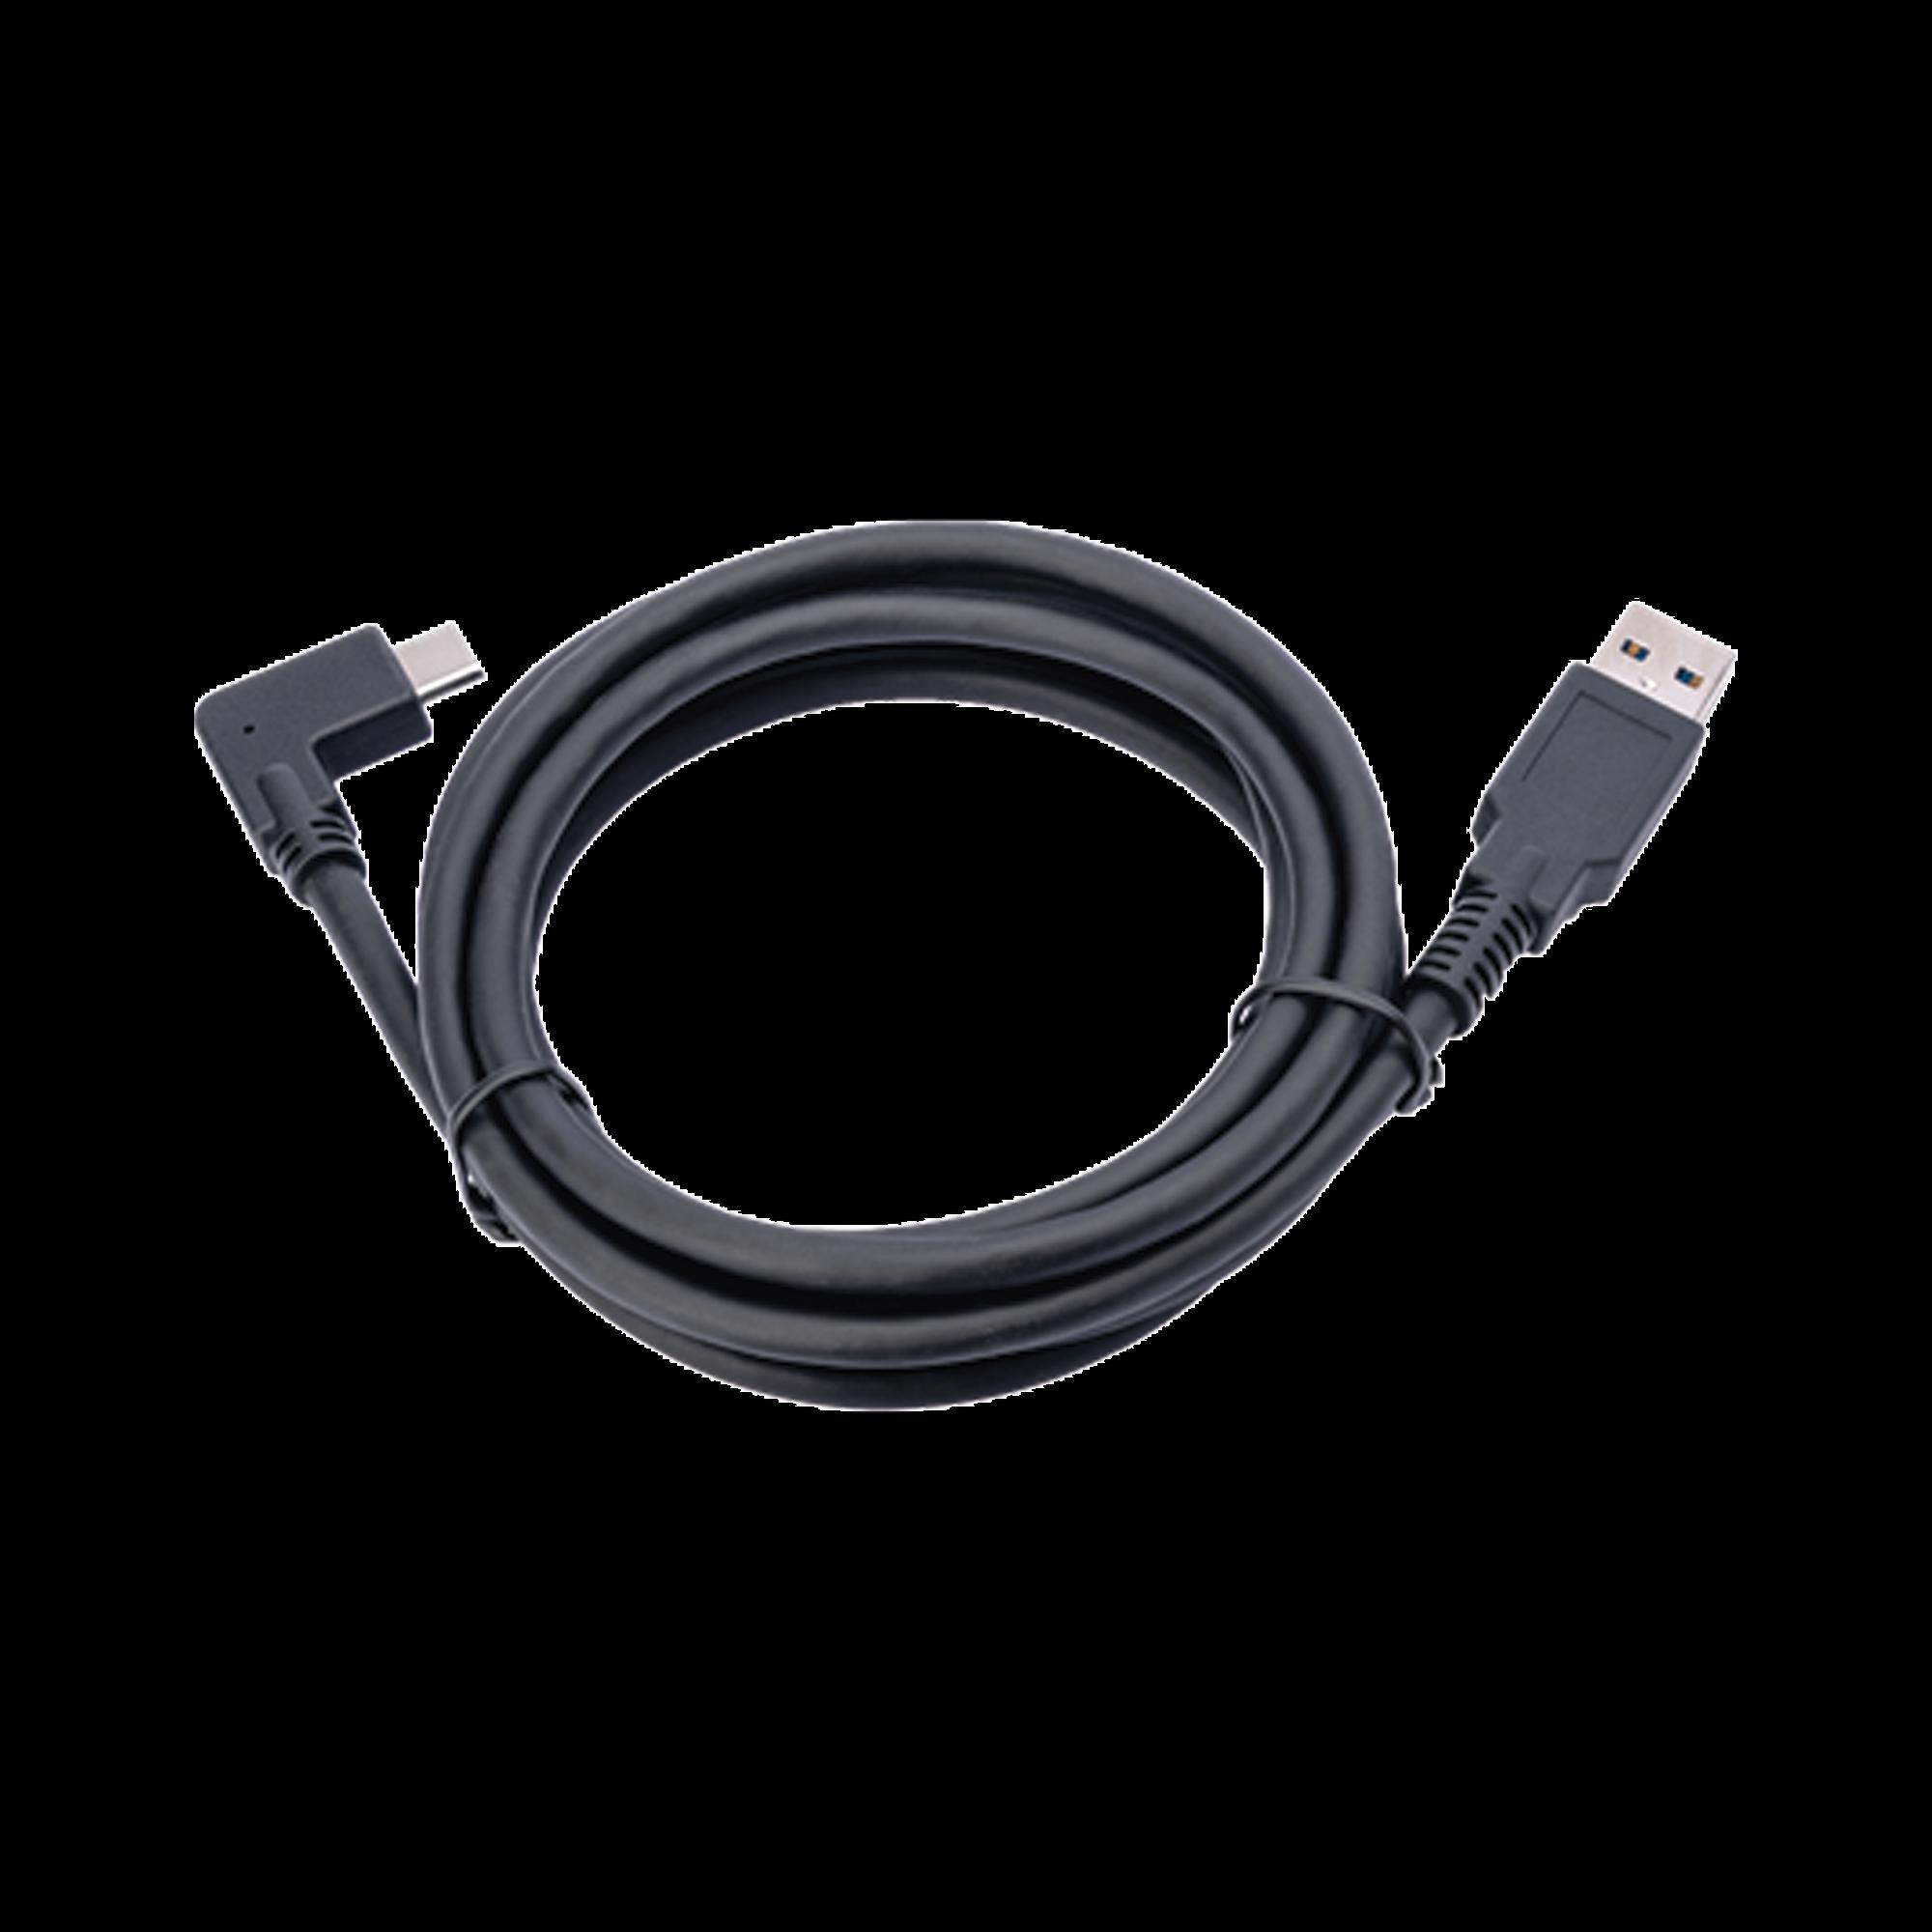 Cable USB de 1.8 metros para modelo PanaCast (14202-09)